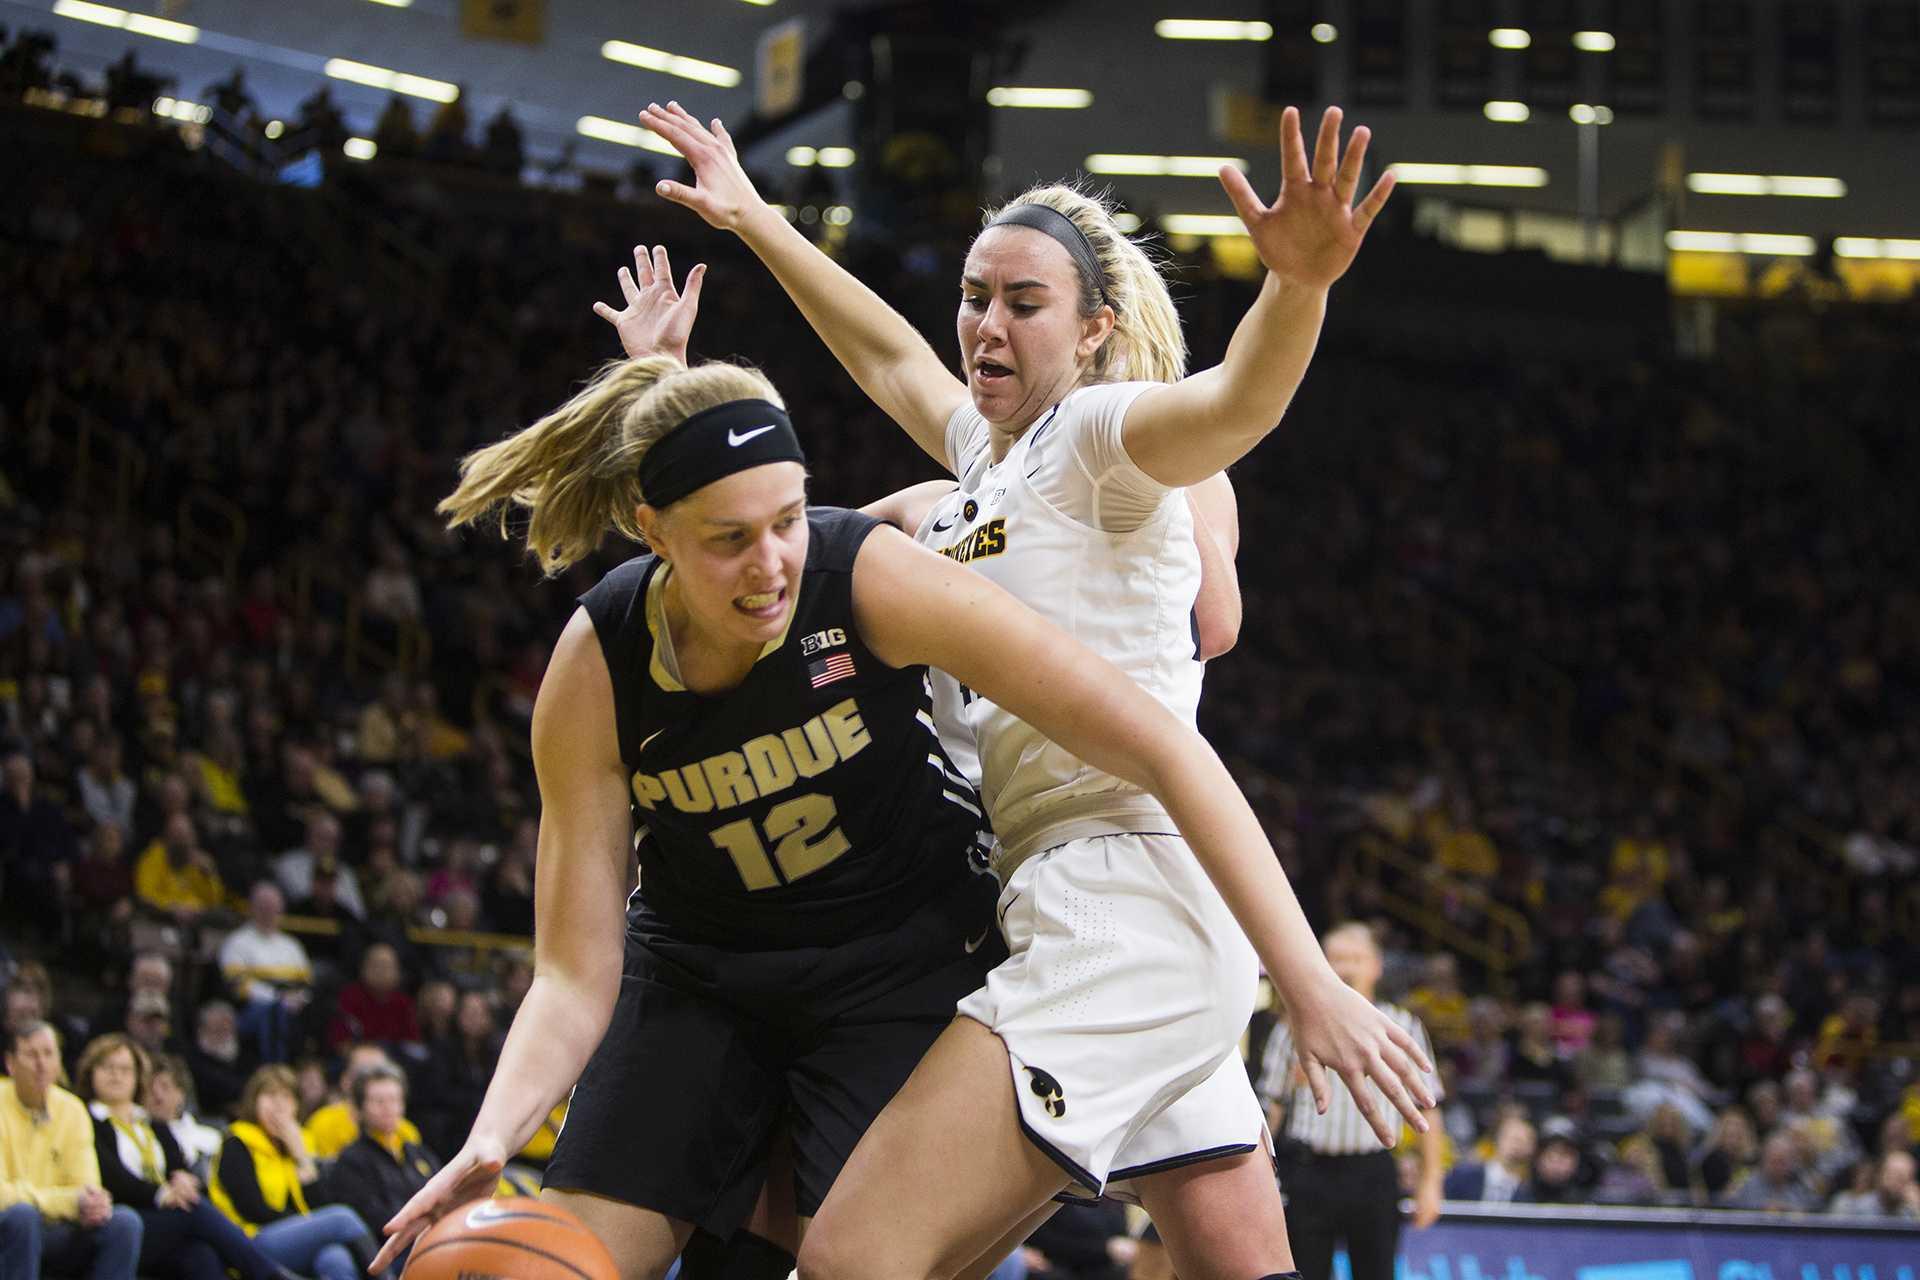 Photos: Iowa women's basketball vs. Purdue (01/13/17)